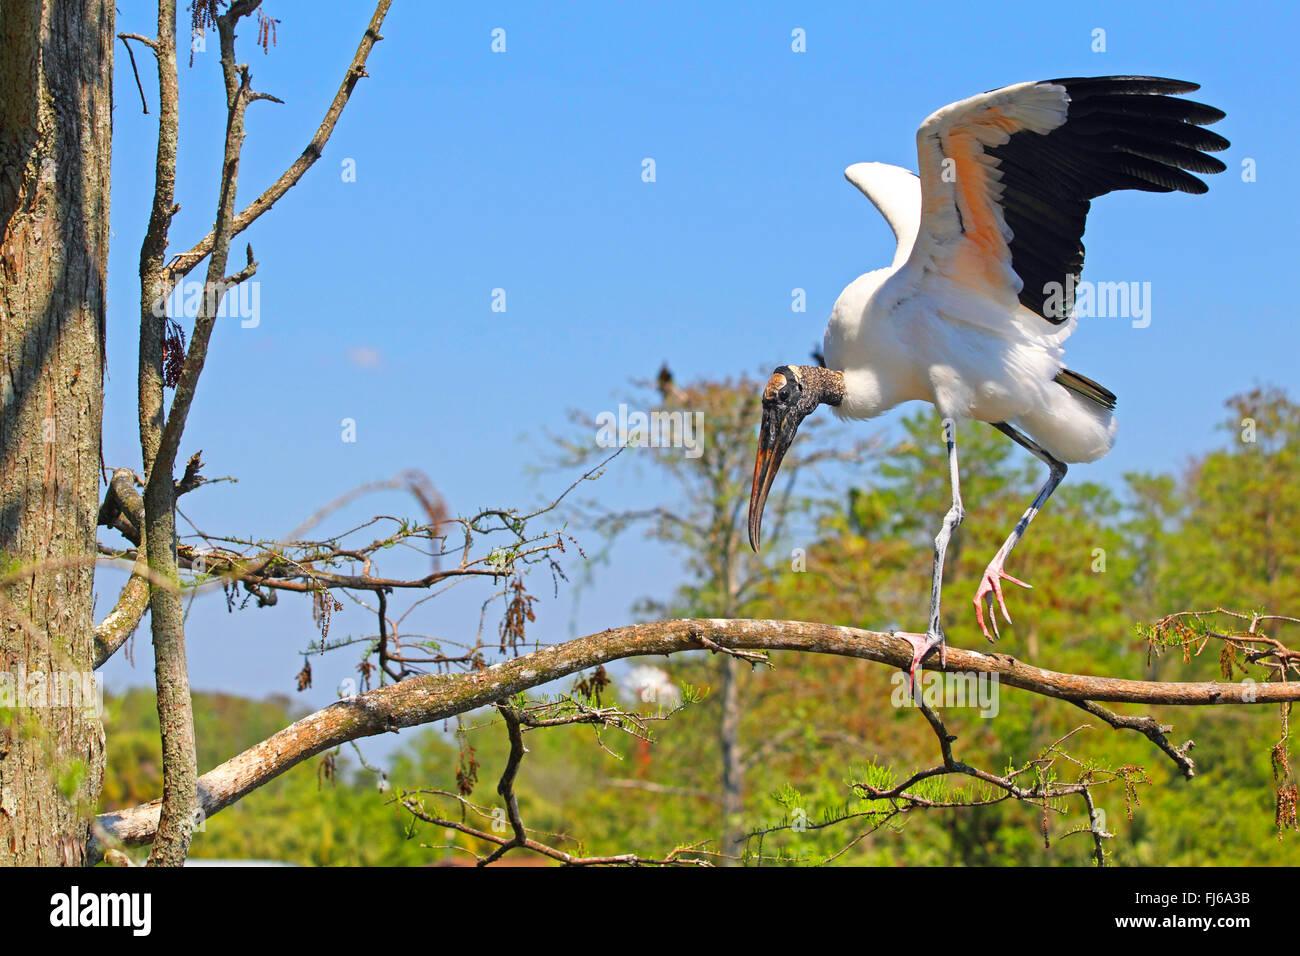 American wood ibis (Mycteria americana), flapping wings on a tree, USA, Florida, Gatorland - Stock Image